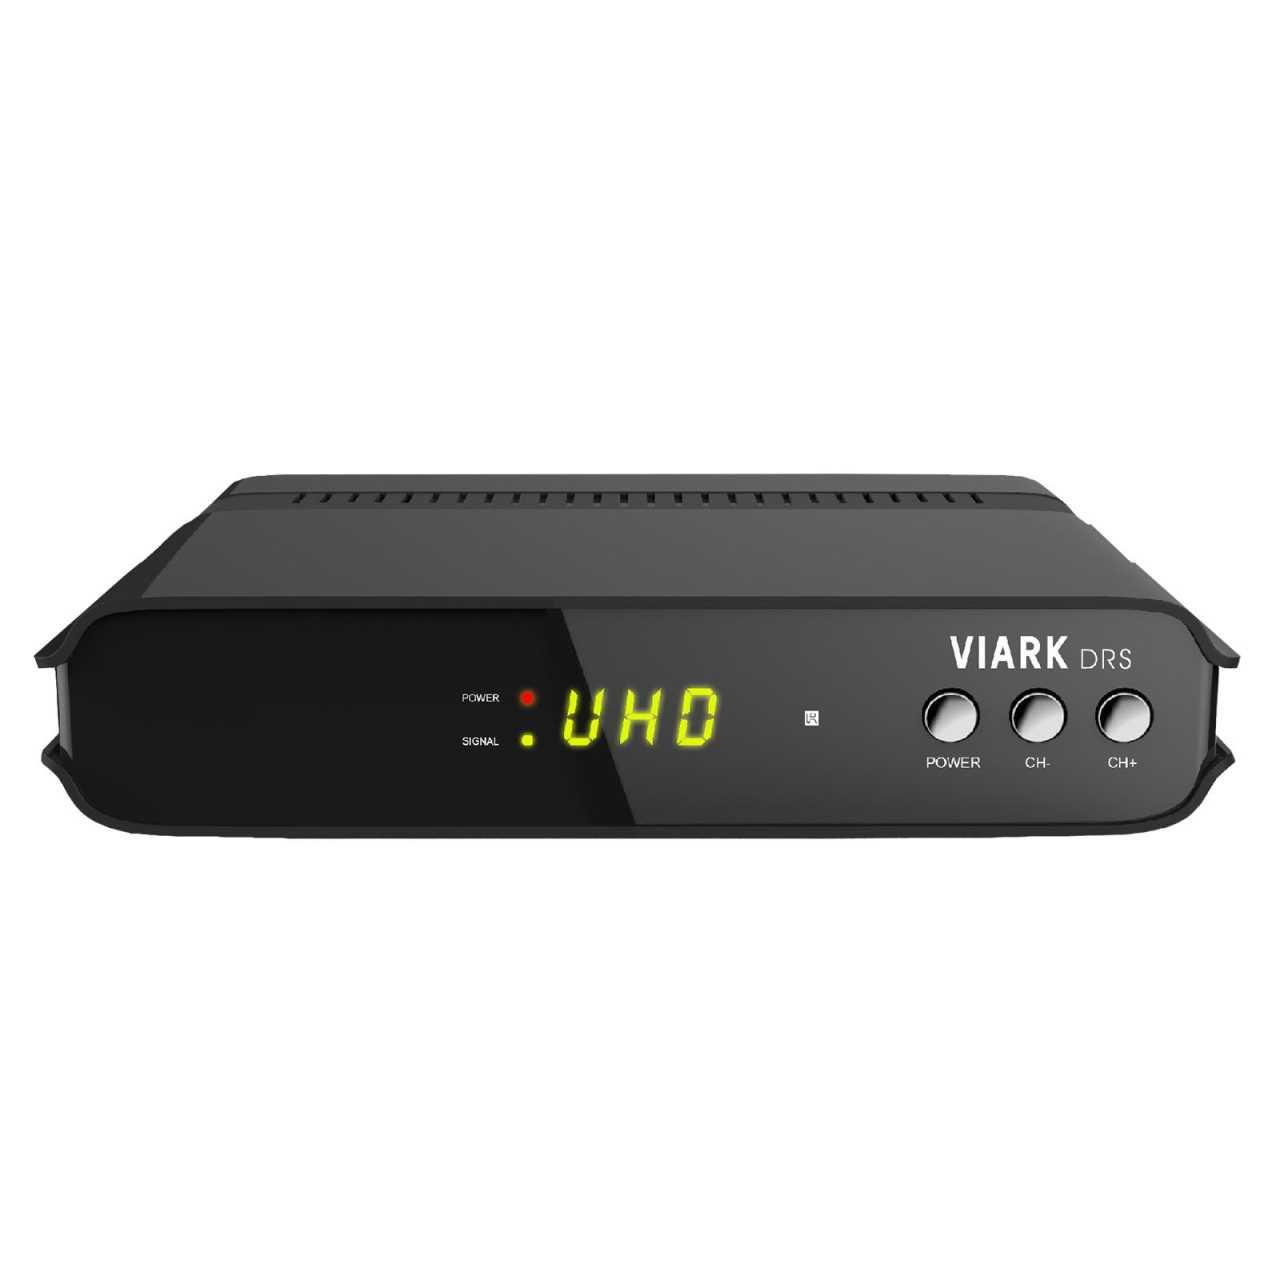 Viark DRS 4K 2160p H.265 Android 7.0 Wifi DVB-S2 Multistream Sat Receiver Schwarz RECVIA005